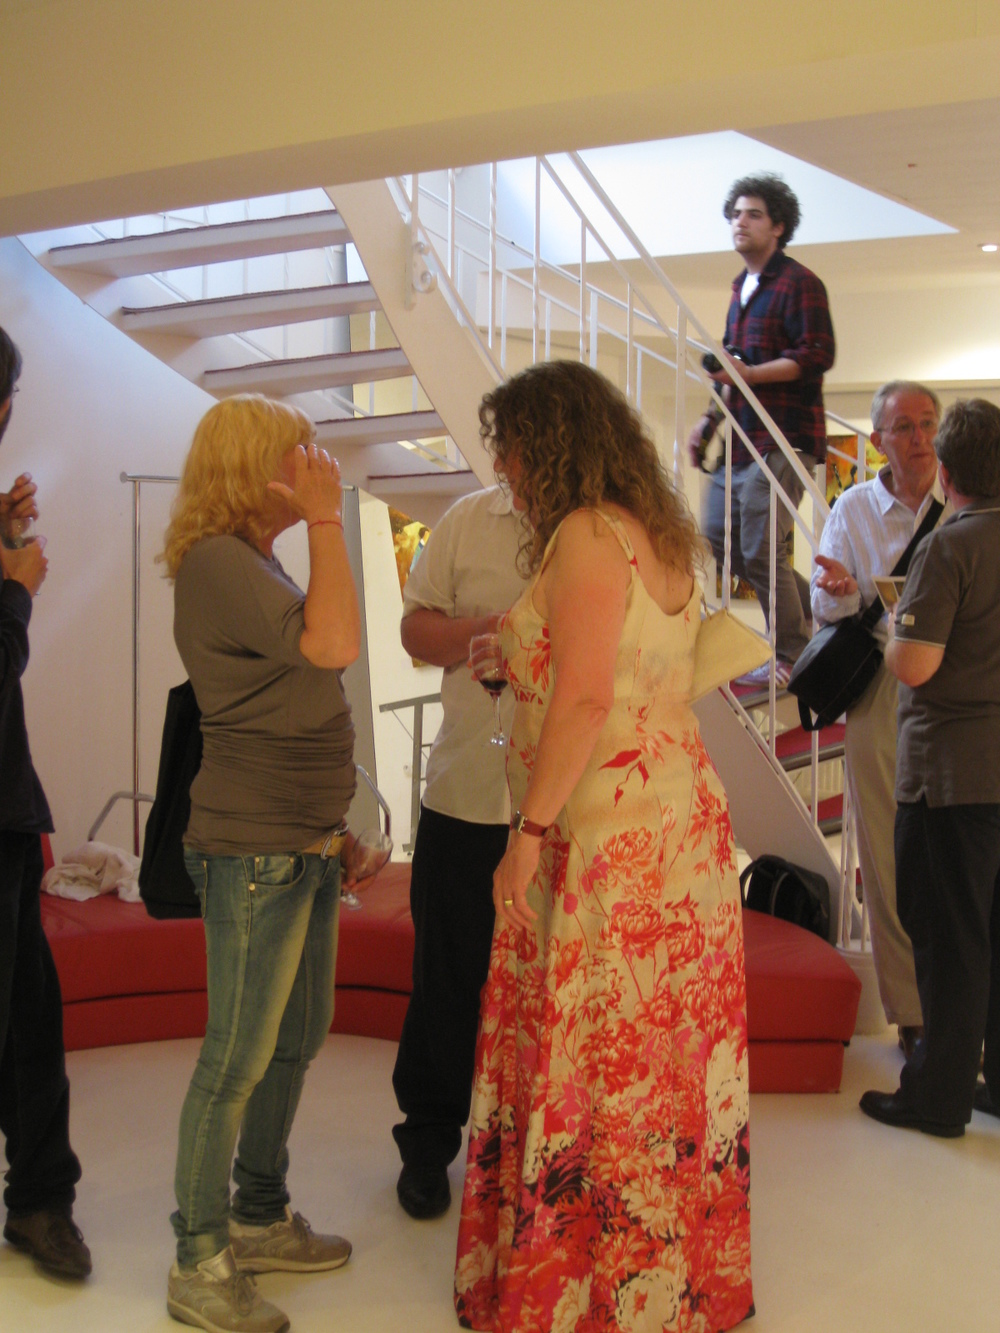 Art Galleries Europe, Exhibition Opening, 5-25-2012 (5).JPG